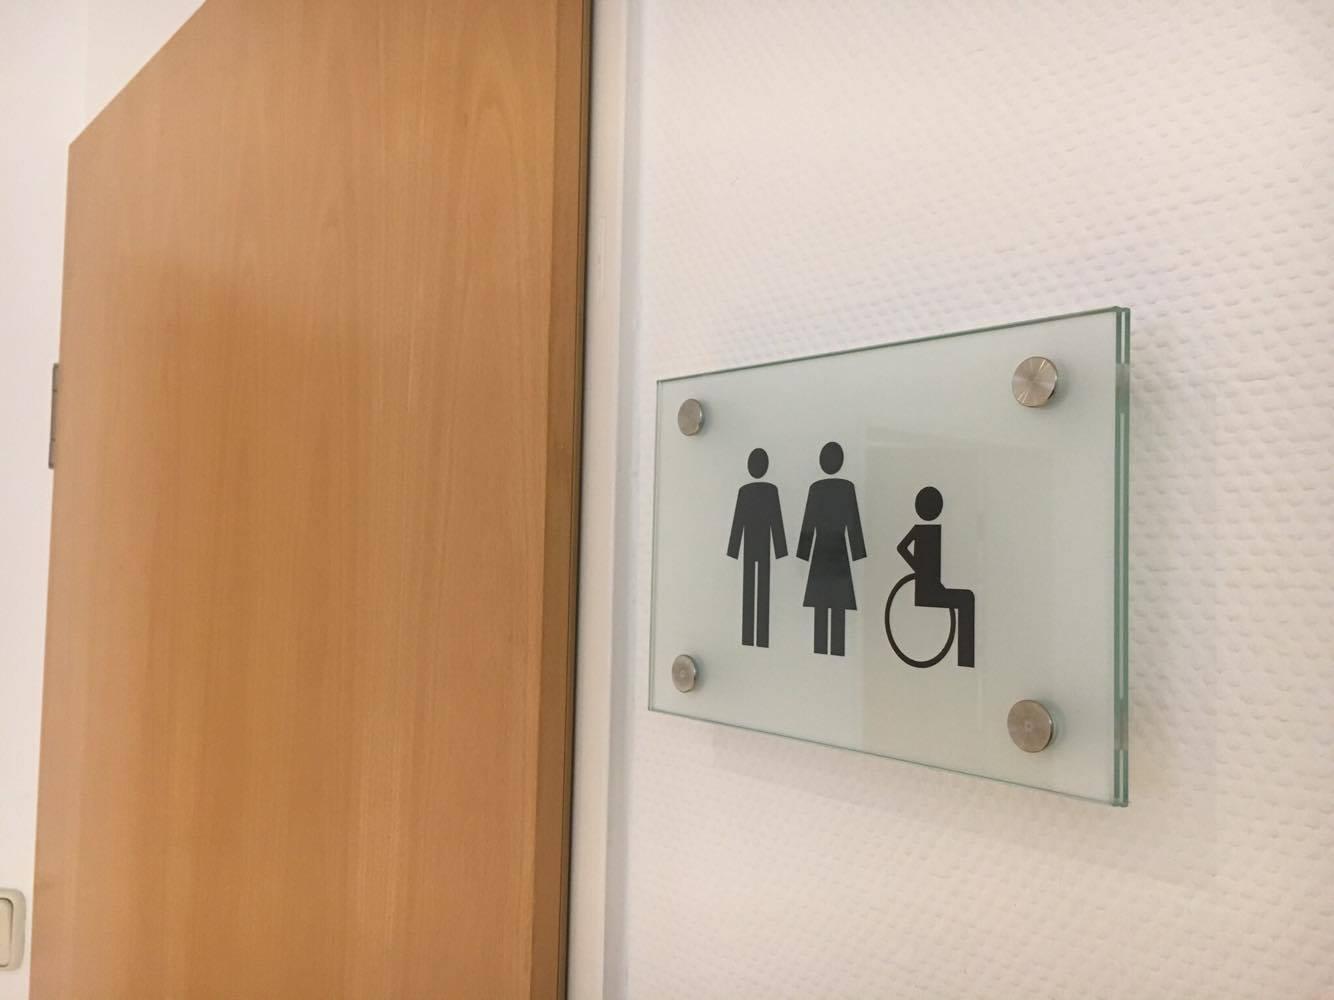 Unser Patienten-WC ist behindertengerecht